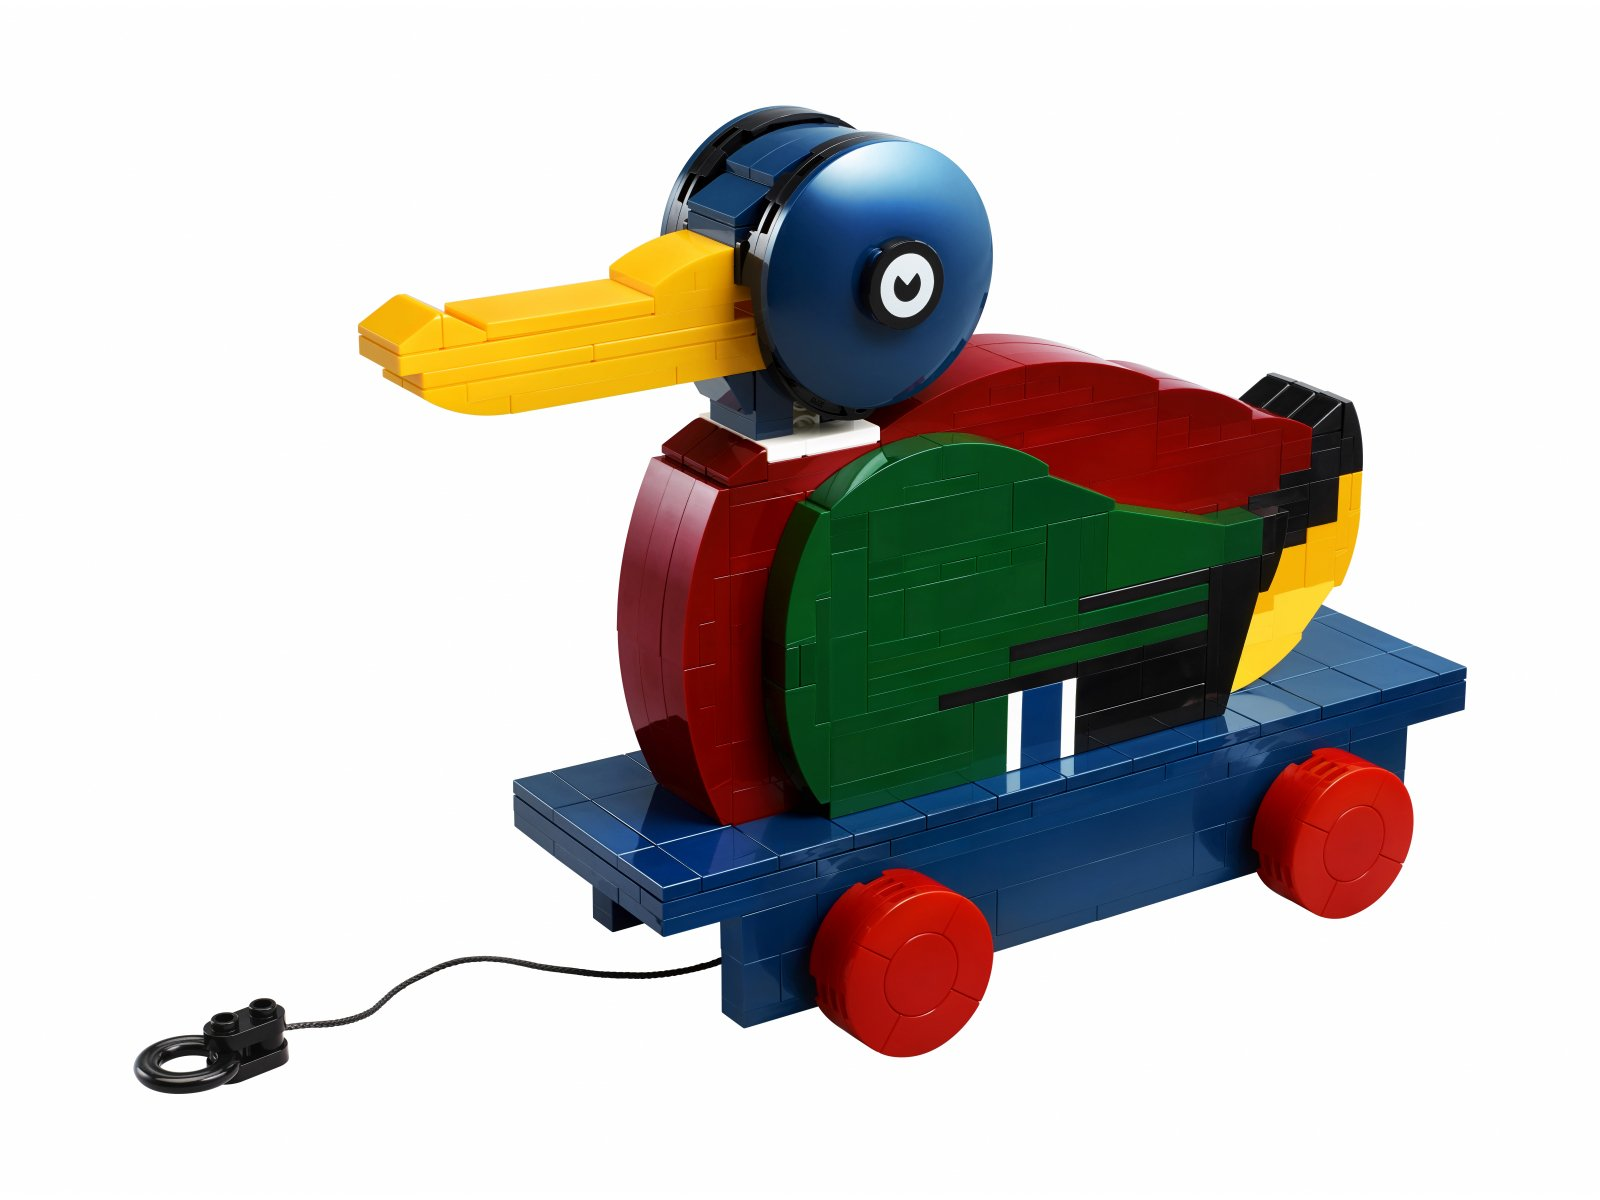 LEGO 40501 House Drewniana kaczka